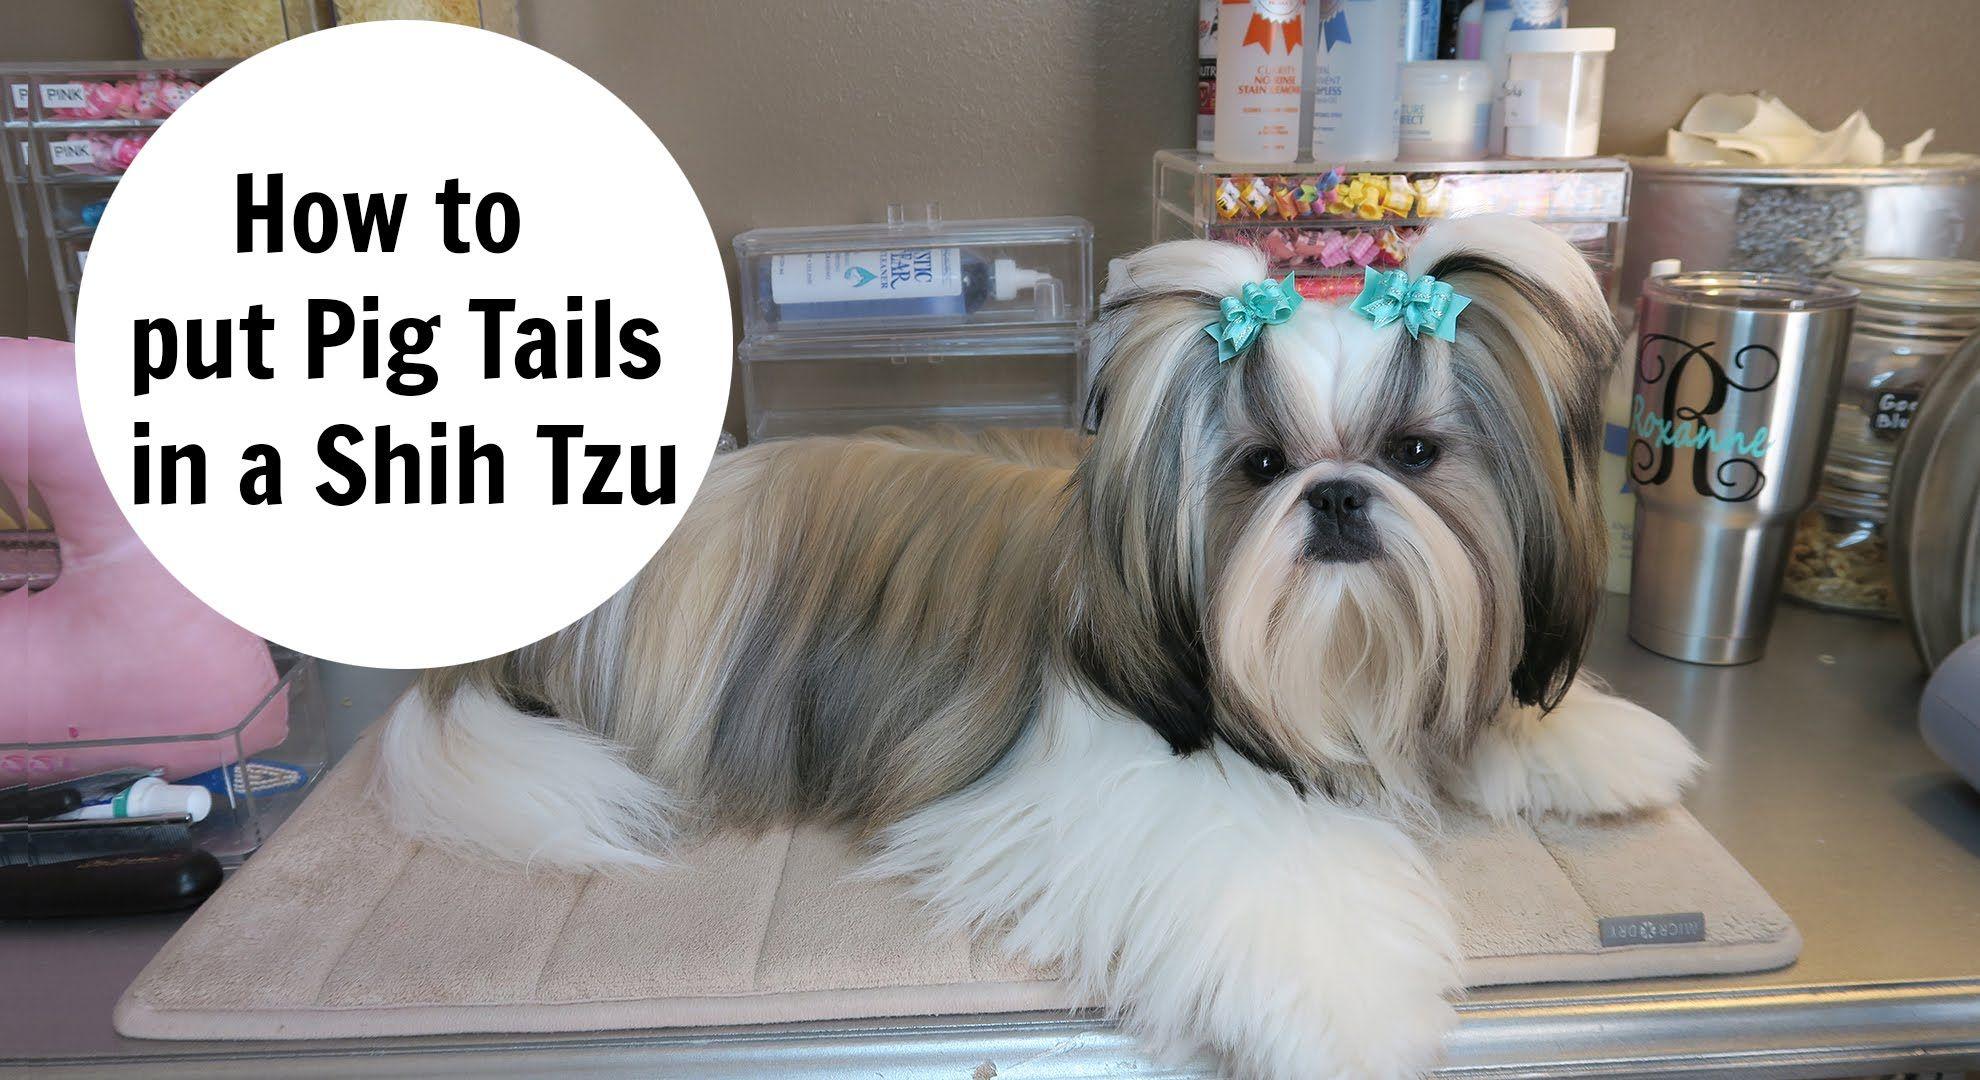 How To Put Pigtails In Your Dog Youtube Shih Tzu Grooming Shih Tzu Shih Tzu Haircuts